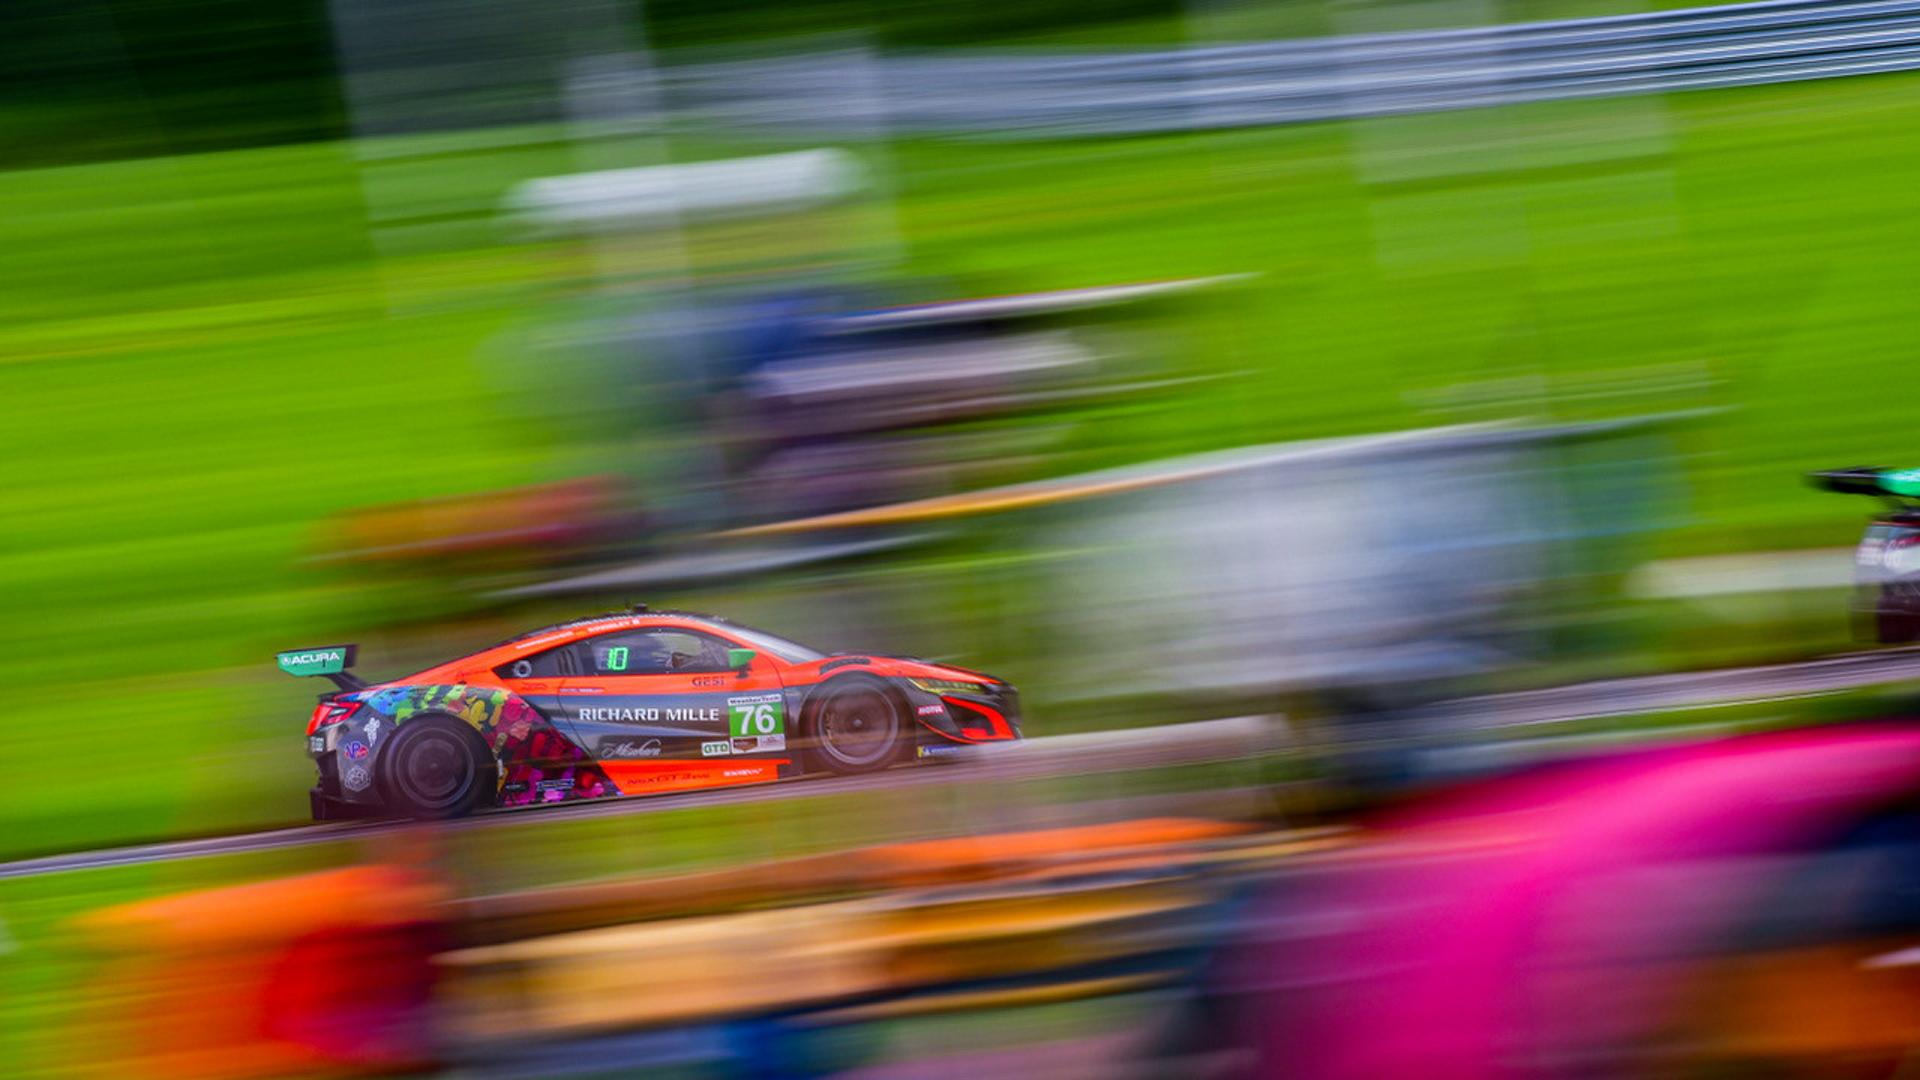 Premature race halt dashes hopes of better result